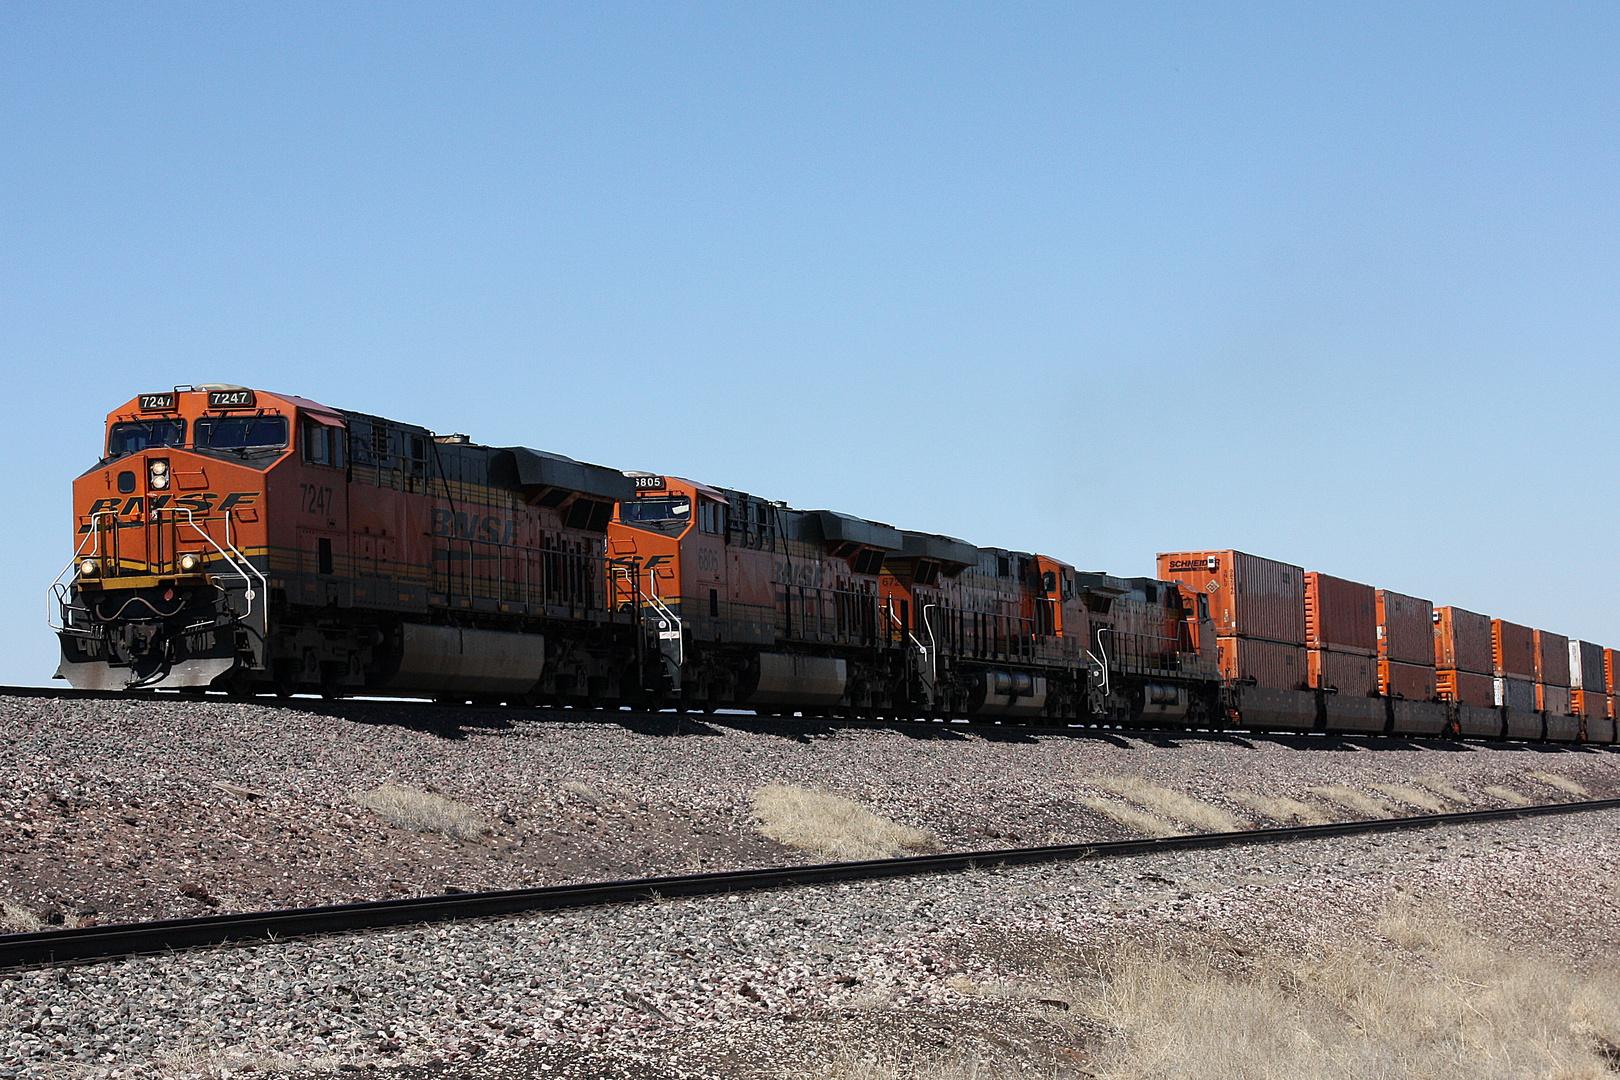 BNSF 7247